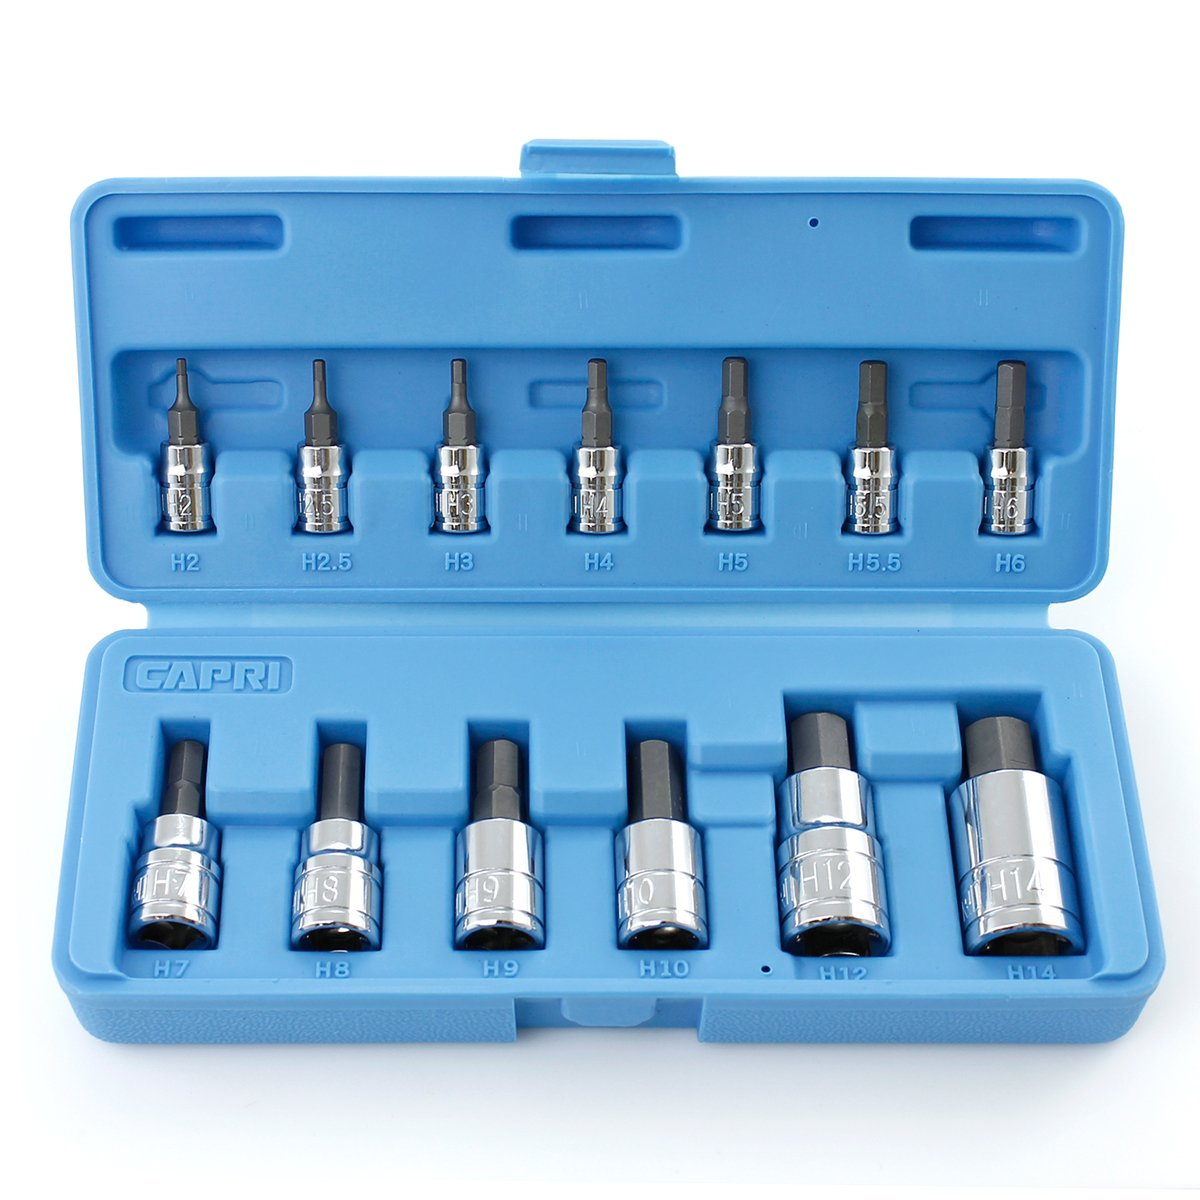 Capri Tools CP30002 S2 Metric Hex Wrench Bit Socket Sets, 13-Piece